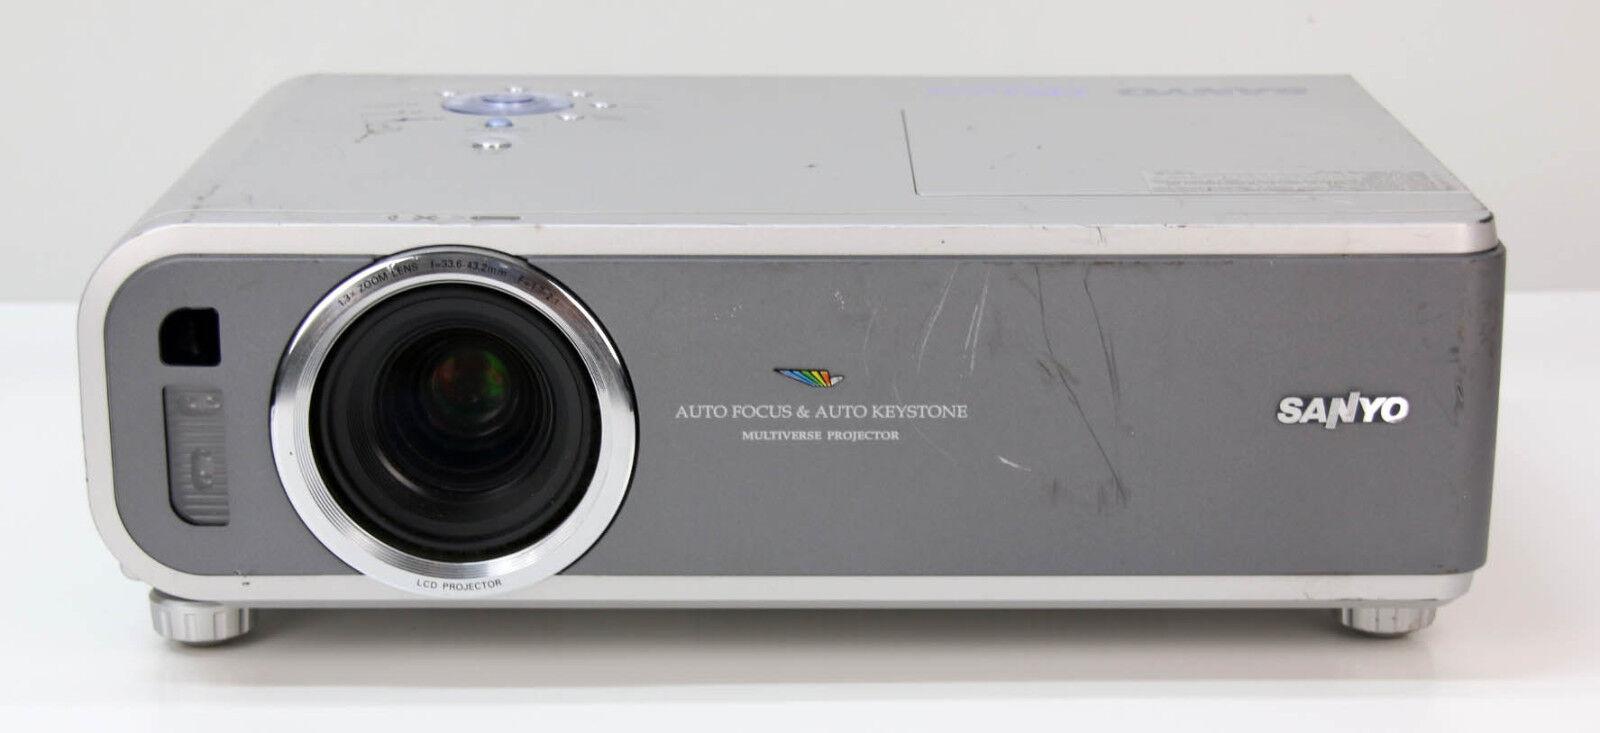 SANYO PLC-XC10 Beamer   Multiverse Projector an Bastler (S64) Videoprojektor